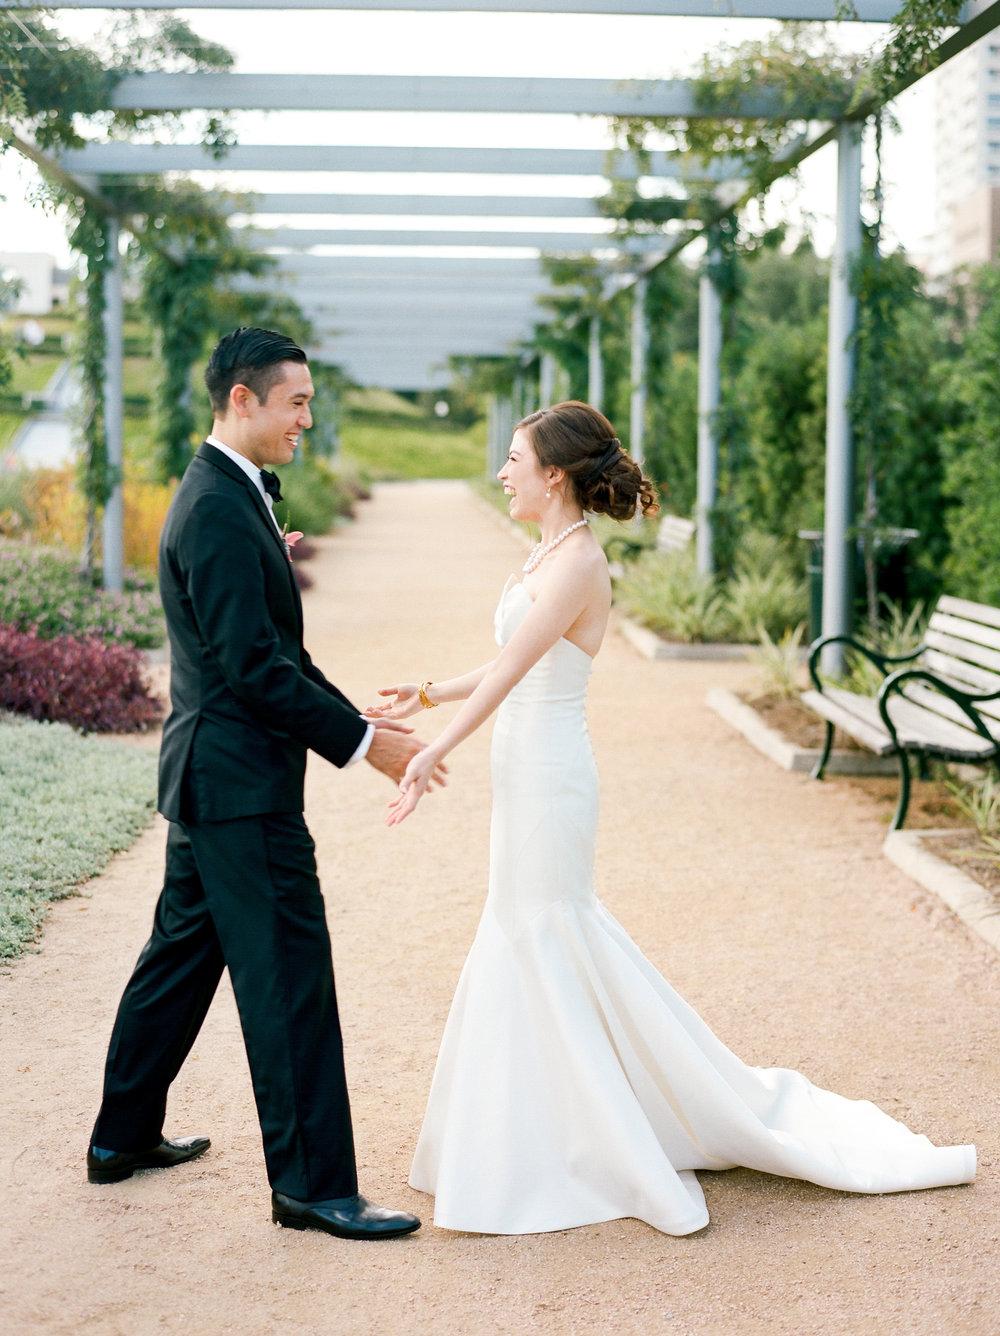 The-Knot-Texas-Magazine-Wedding-Top-Best-Houston-Wedding-Photographer-Fine-Art-Film-Dana-Fernandez-Photography-116.jpg